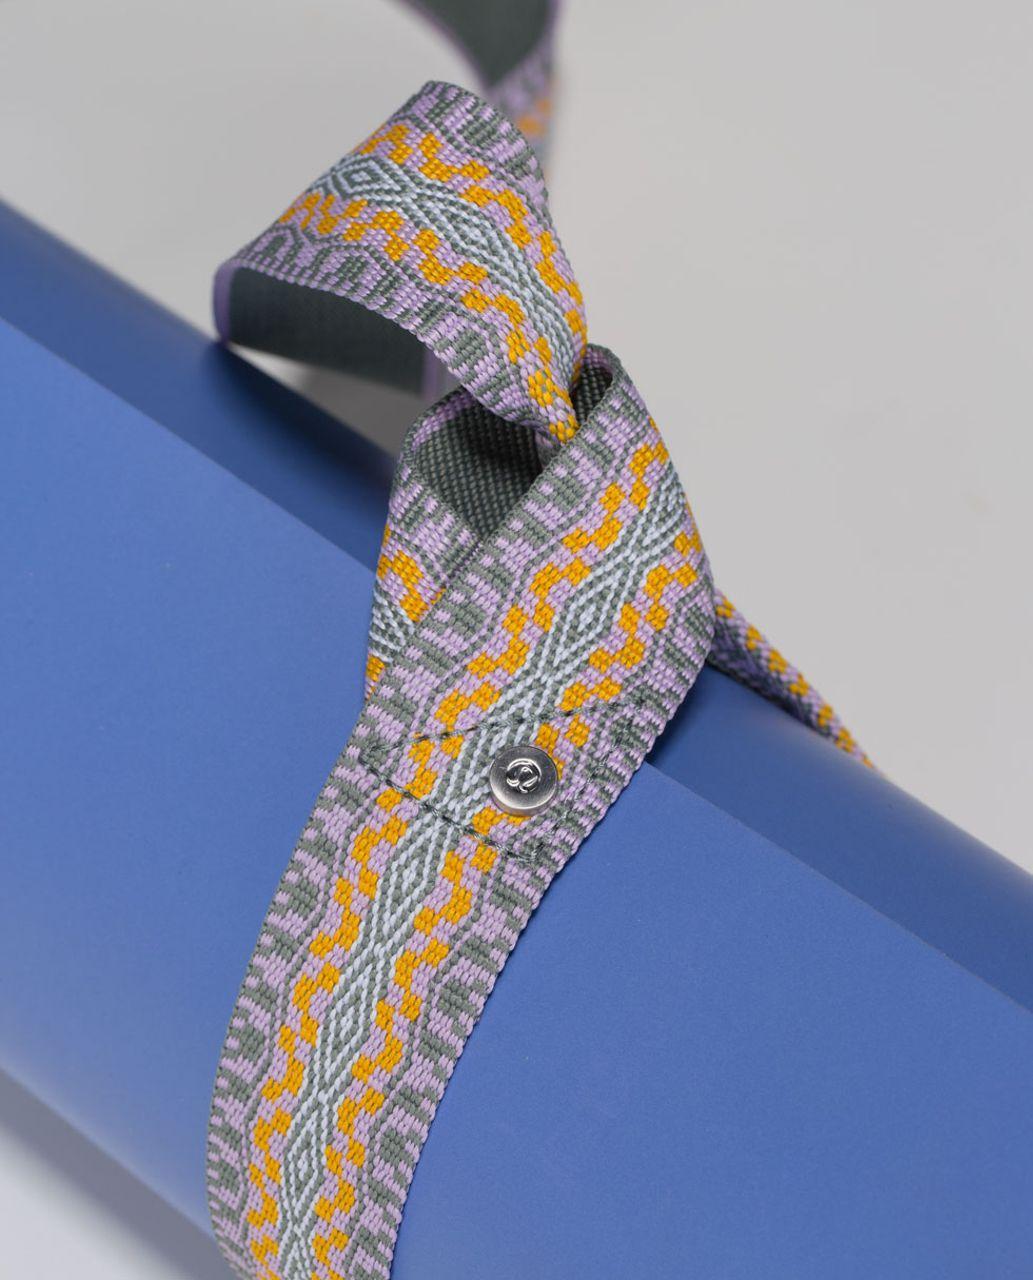 Lululemon Loop It Up Mat Strap - Earl Grey / Pretty Purple / White / Bananarama